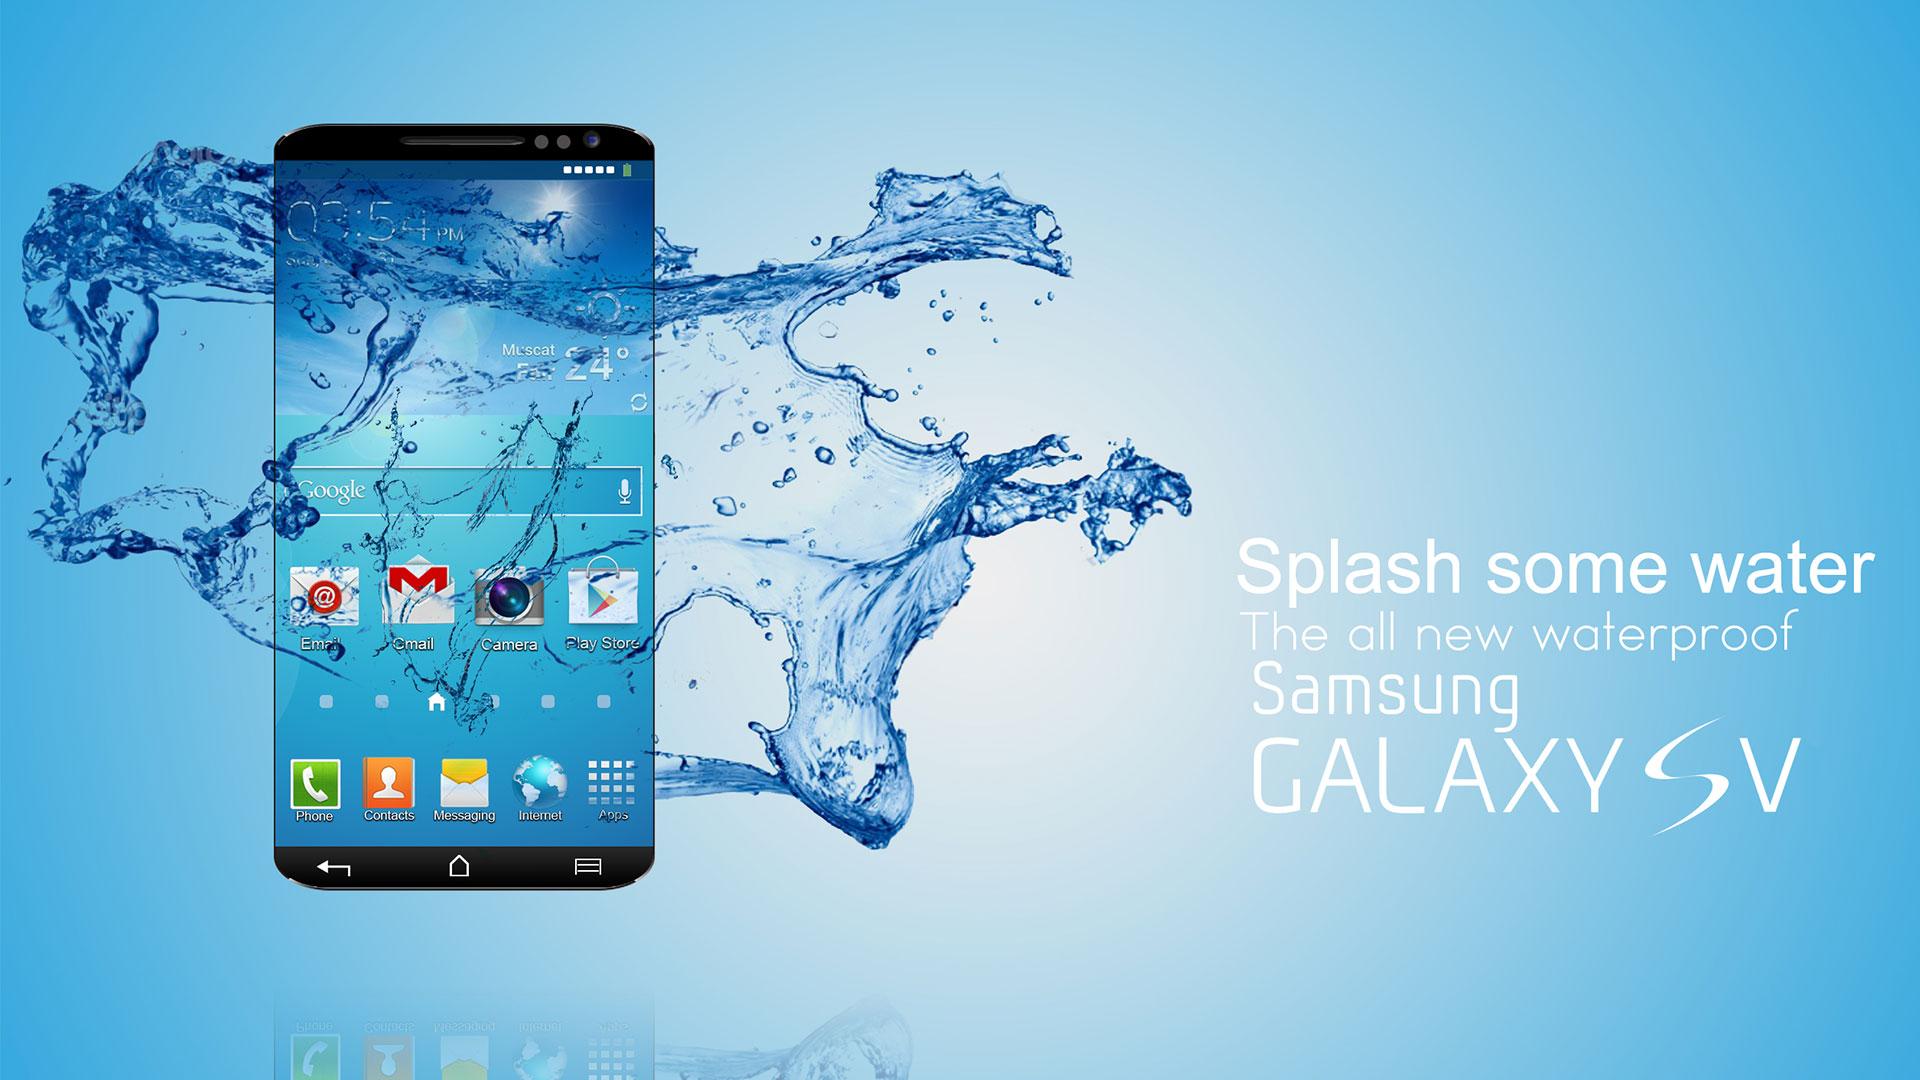 Wallpapers Hd Samsung Galaxy S5 17454 Wallpaper Wallpaper hd 1920x1080